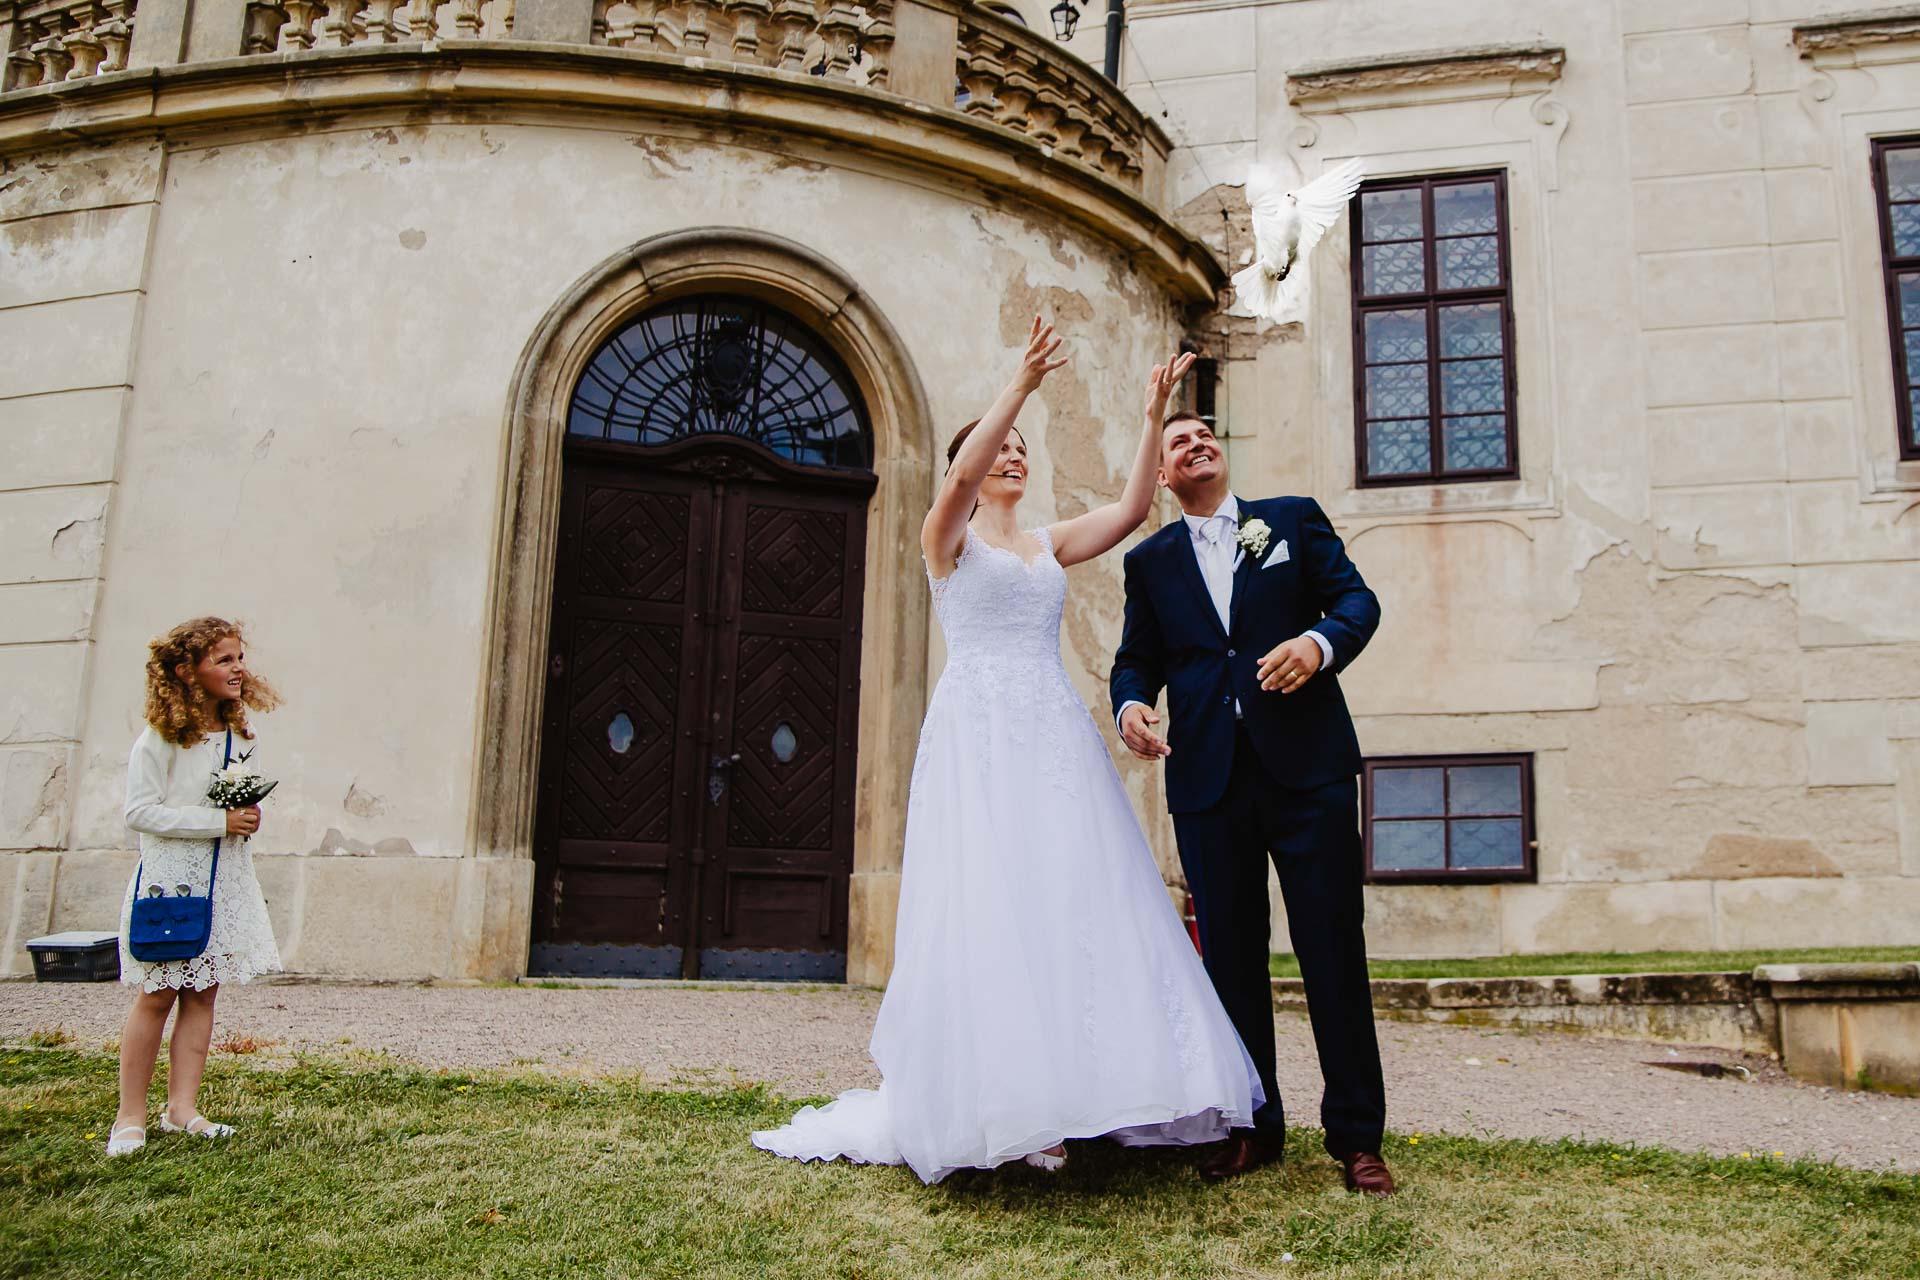 Svatební-fotograf-zámek-Karlova-Koruna-Chlumec-nad-Cidlinou-118